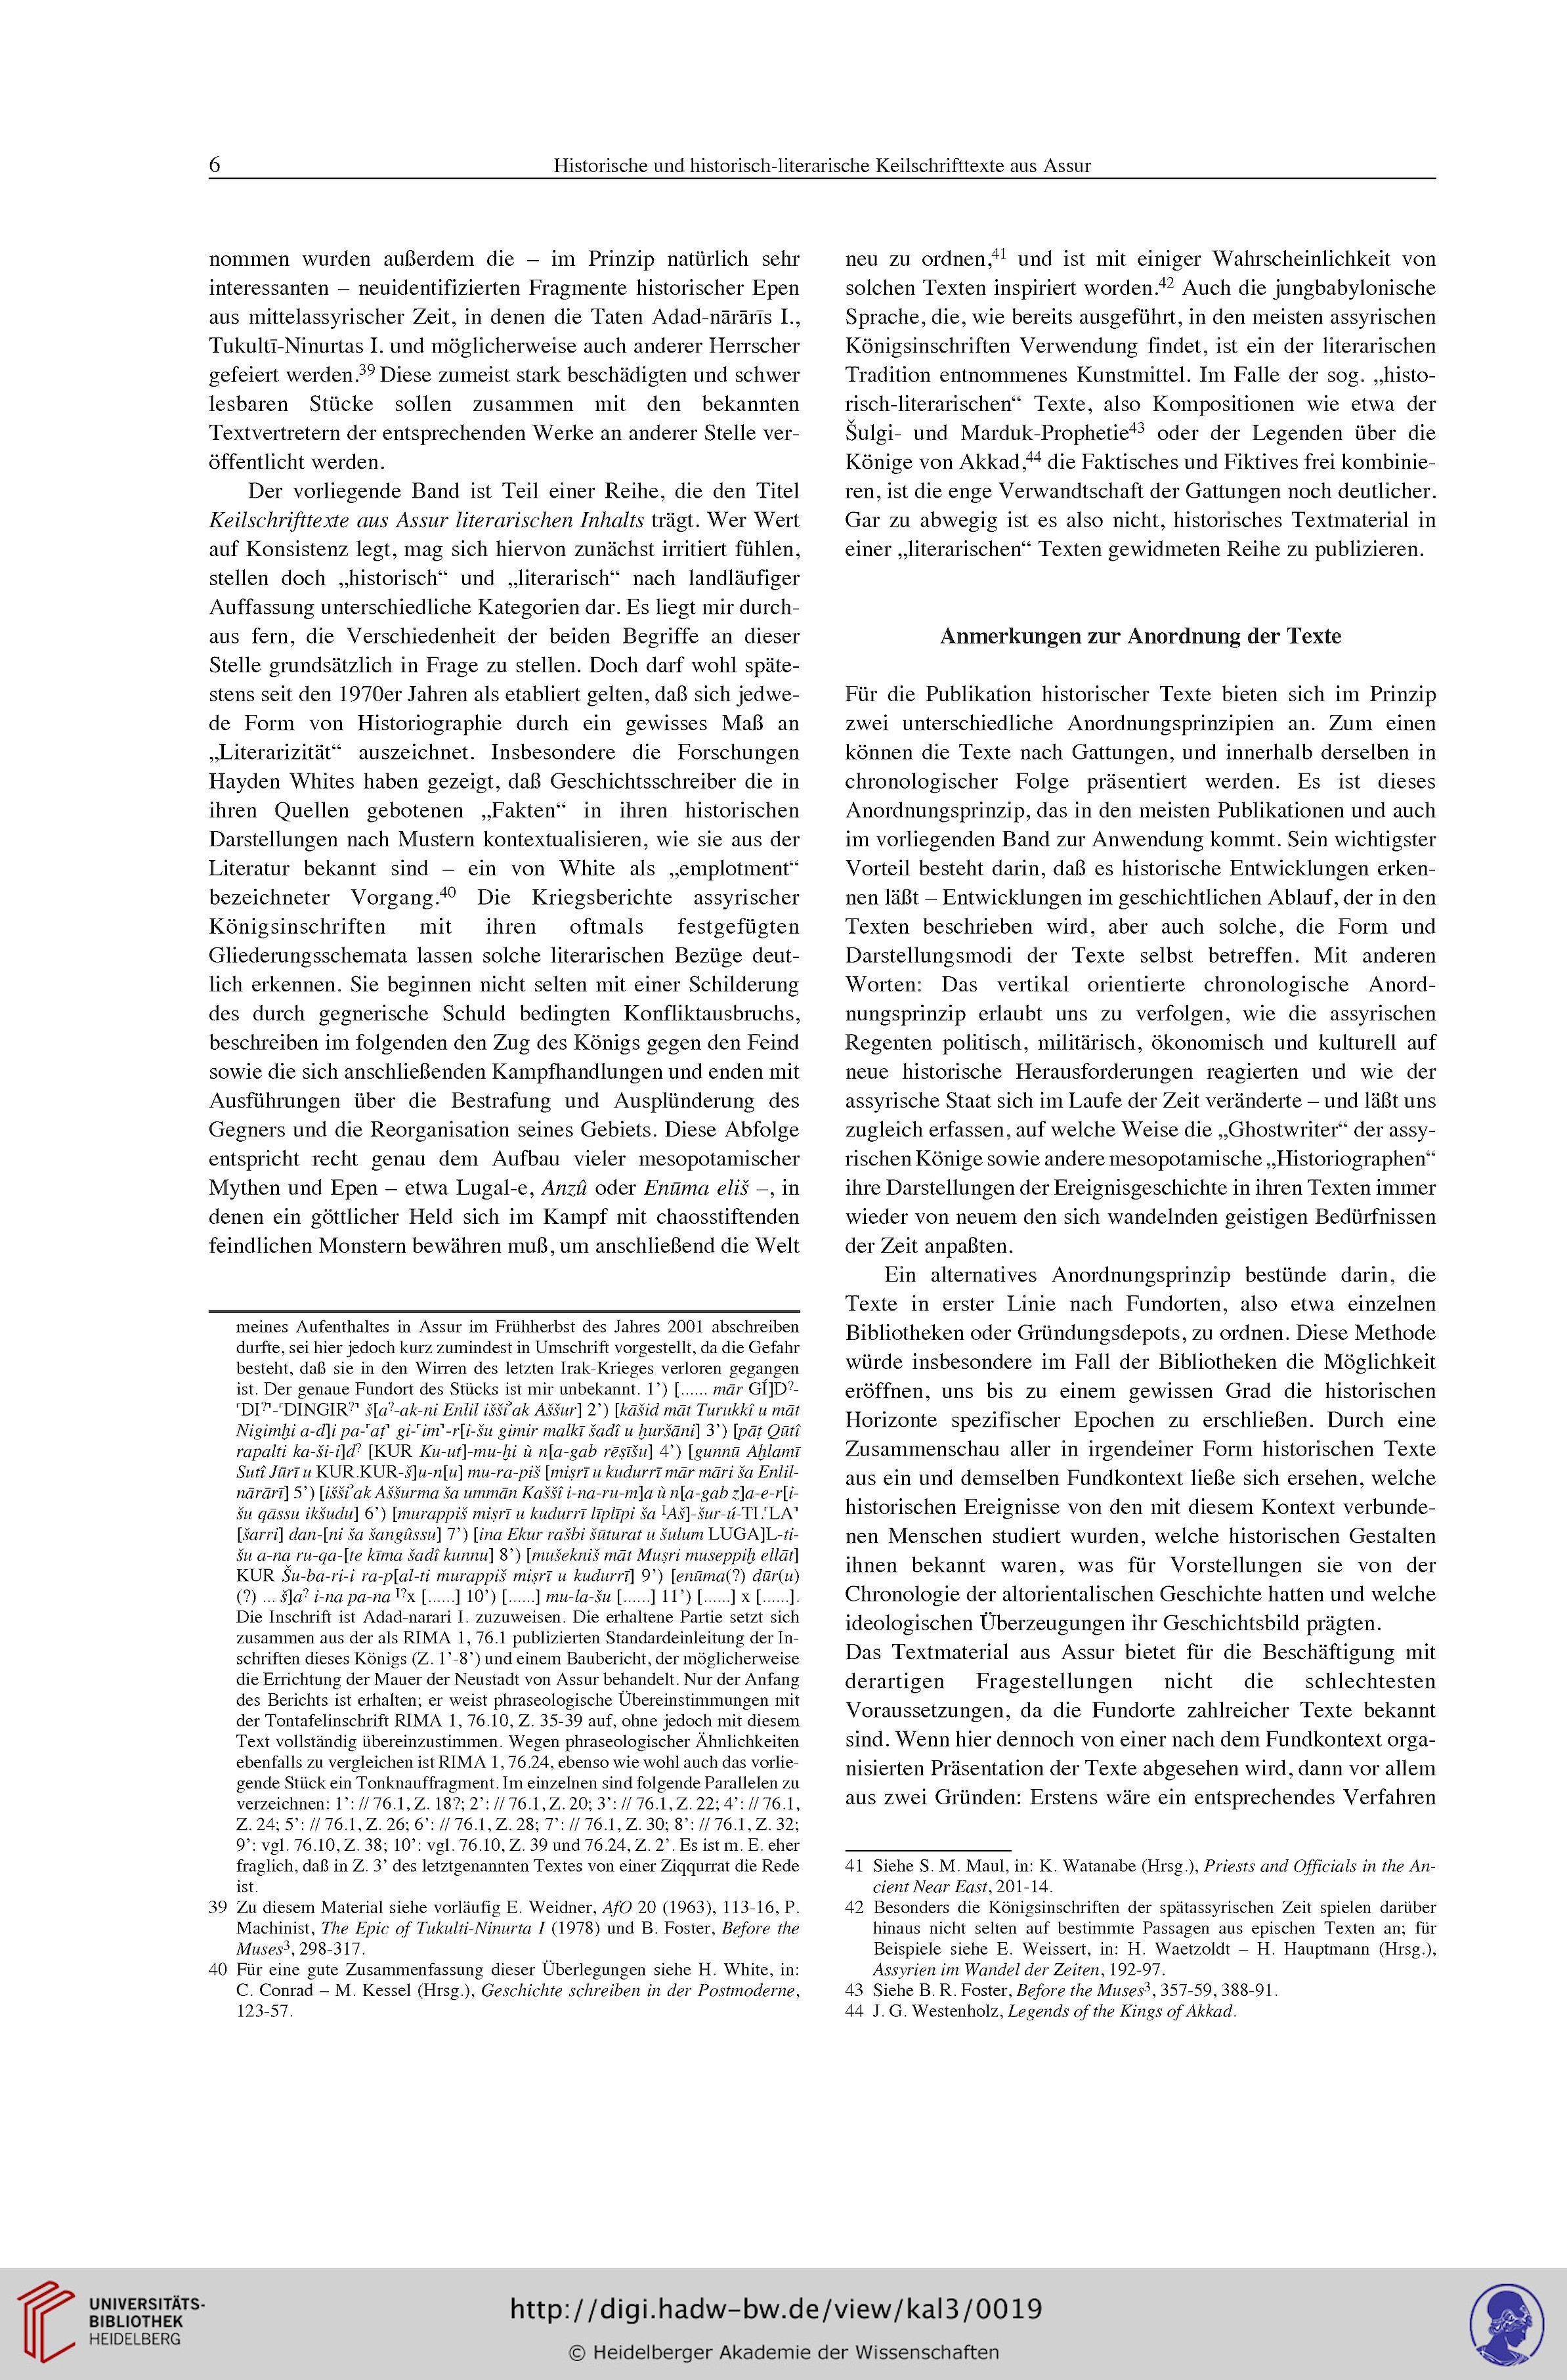 Frahm Eckart Maul Stefan M Hrsg Heidelberger Akademie Der